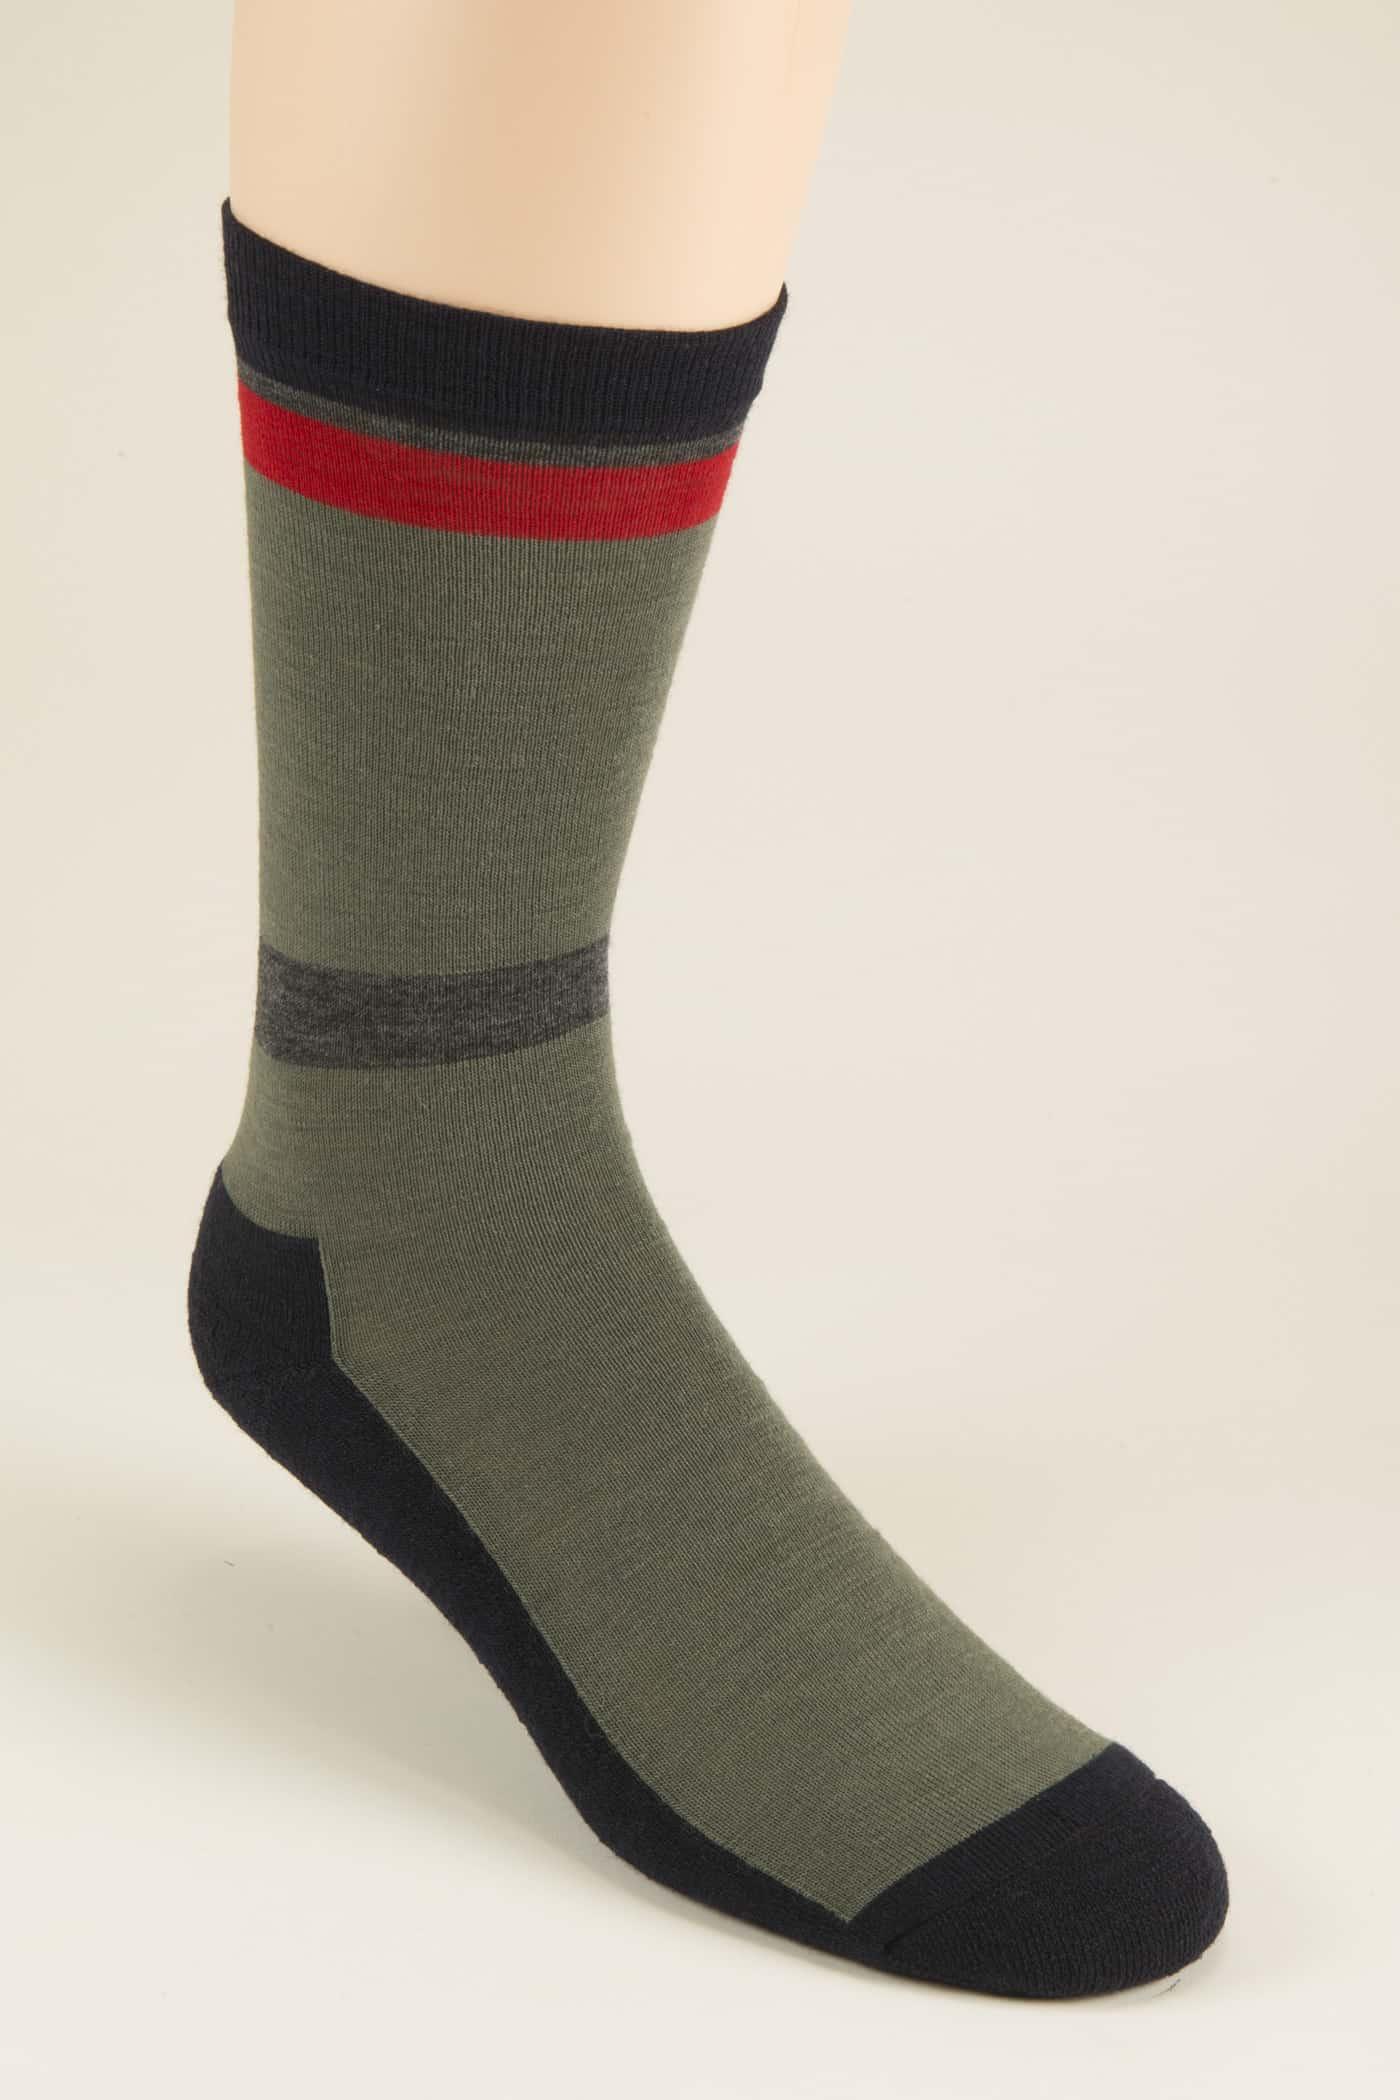 Hartington-B-Black-Grey-Red